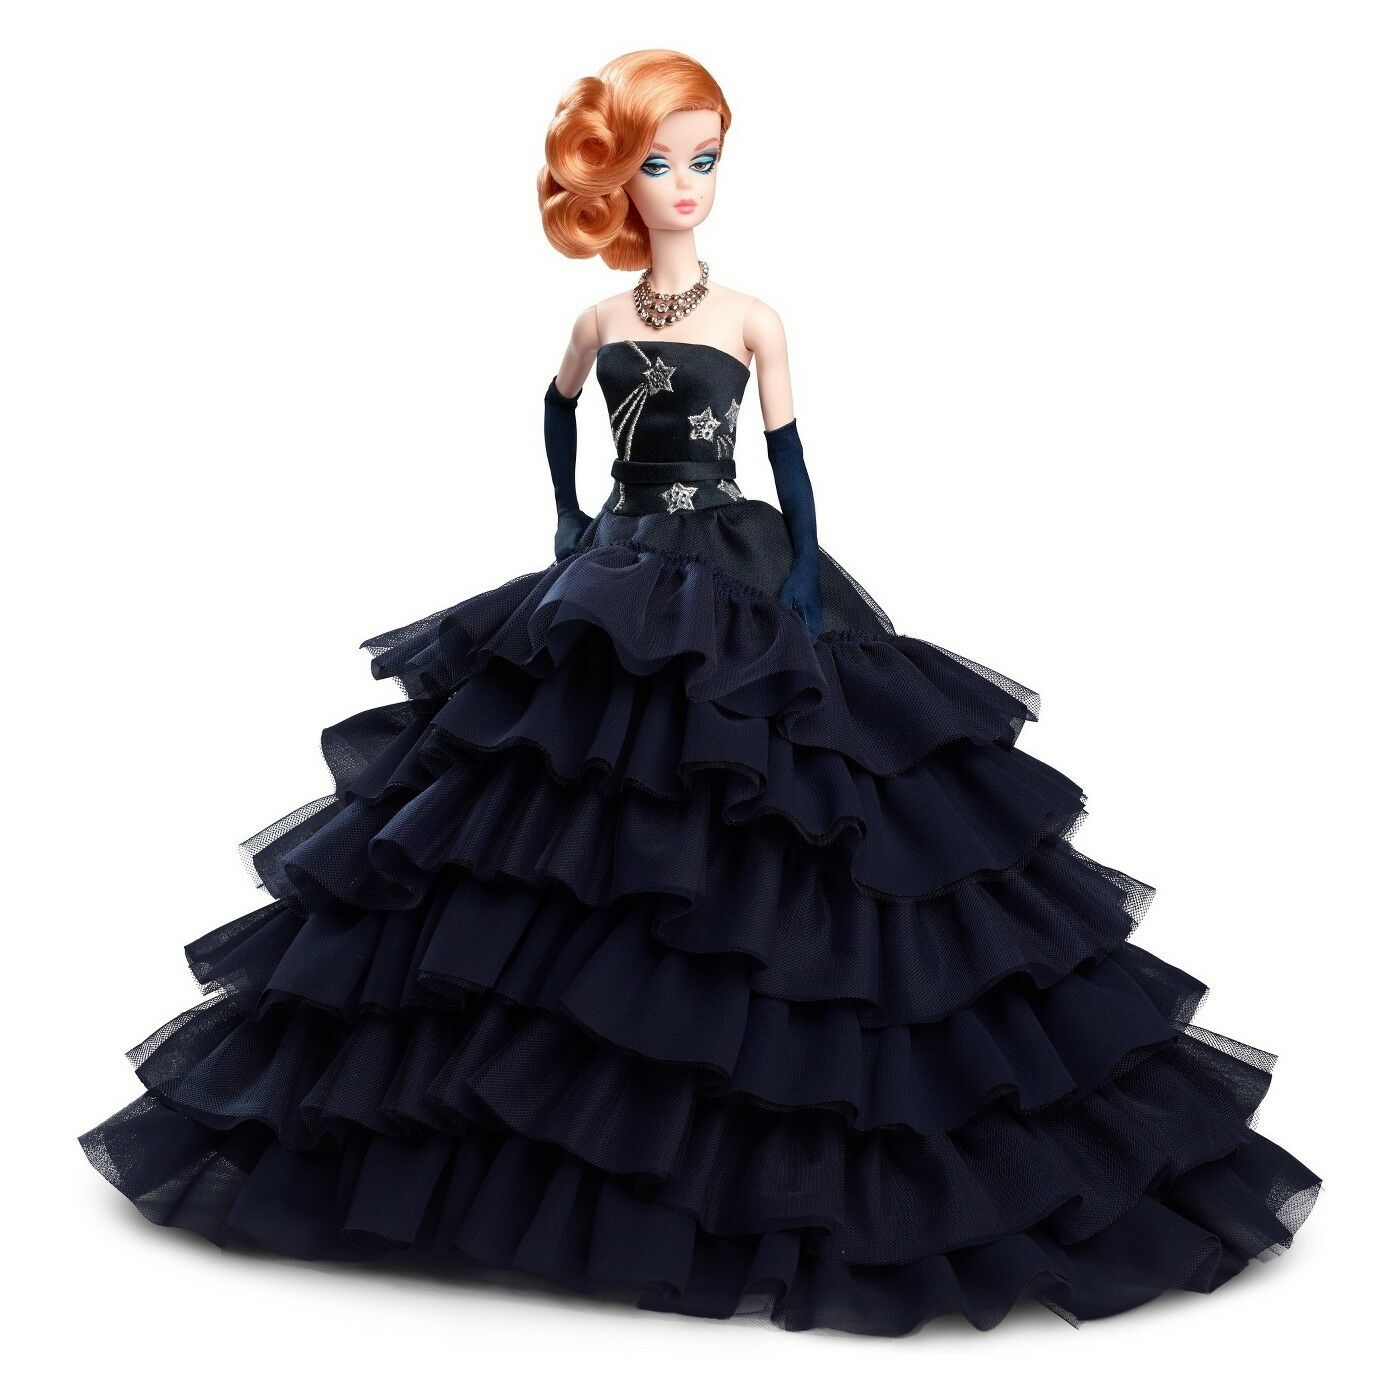 Barbie Collector bfmc medianoche Glamour menta muñeca Silkstone